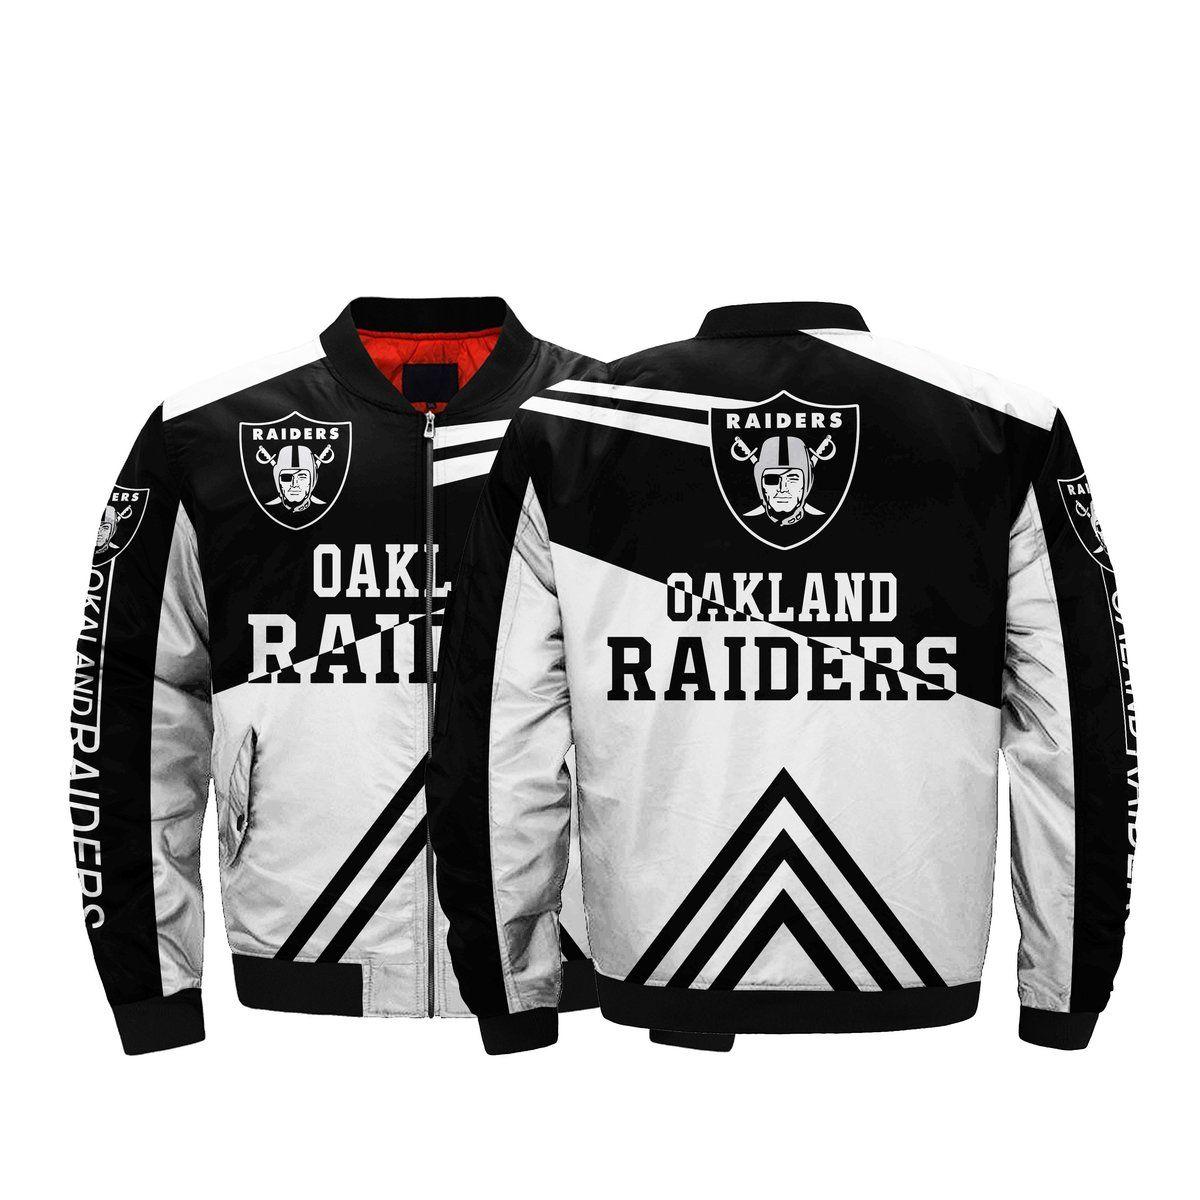 Lower Price Nfl Jacket Men Oakland Raiders Bomber Jacket For Sale Bomber Jacket Winter Mens Jackets Bomber Jacket [ 1200 x 1200 Pixel ]